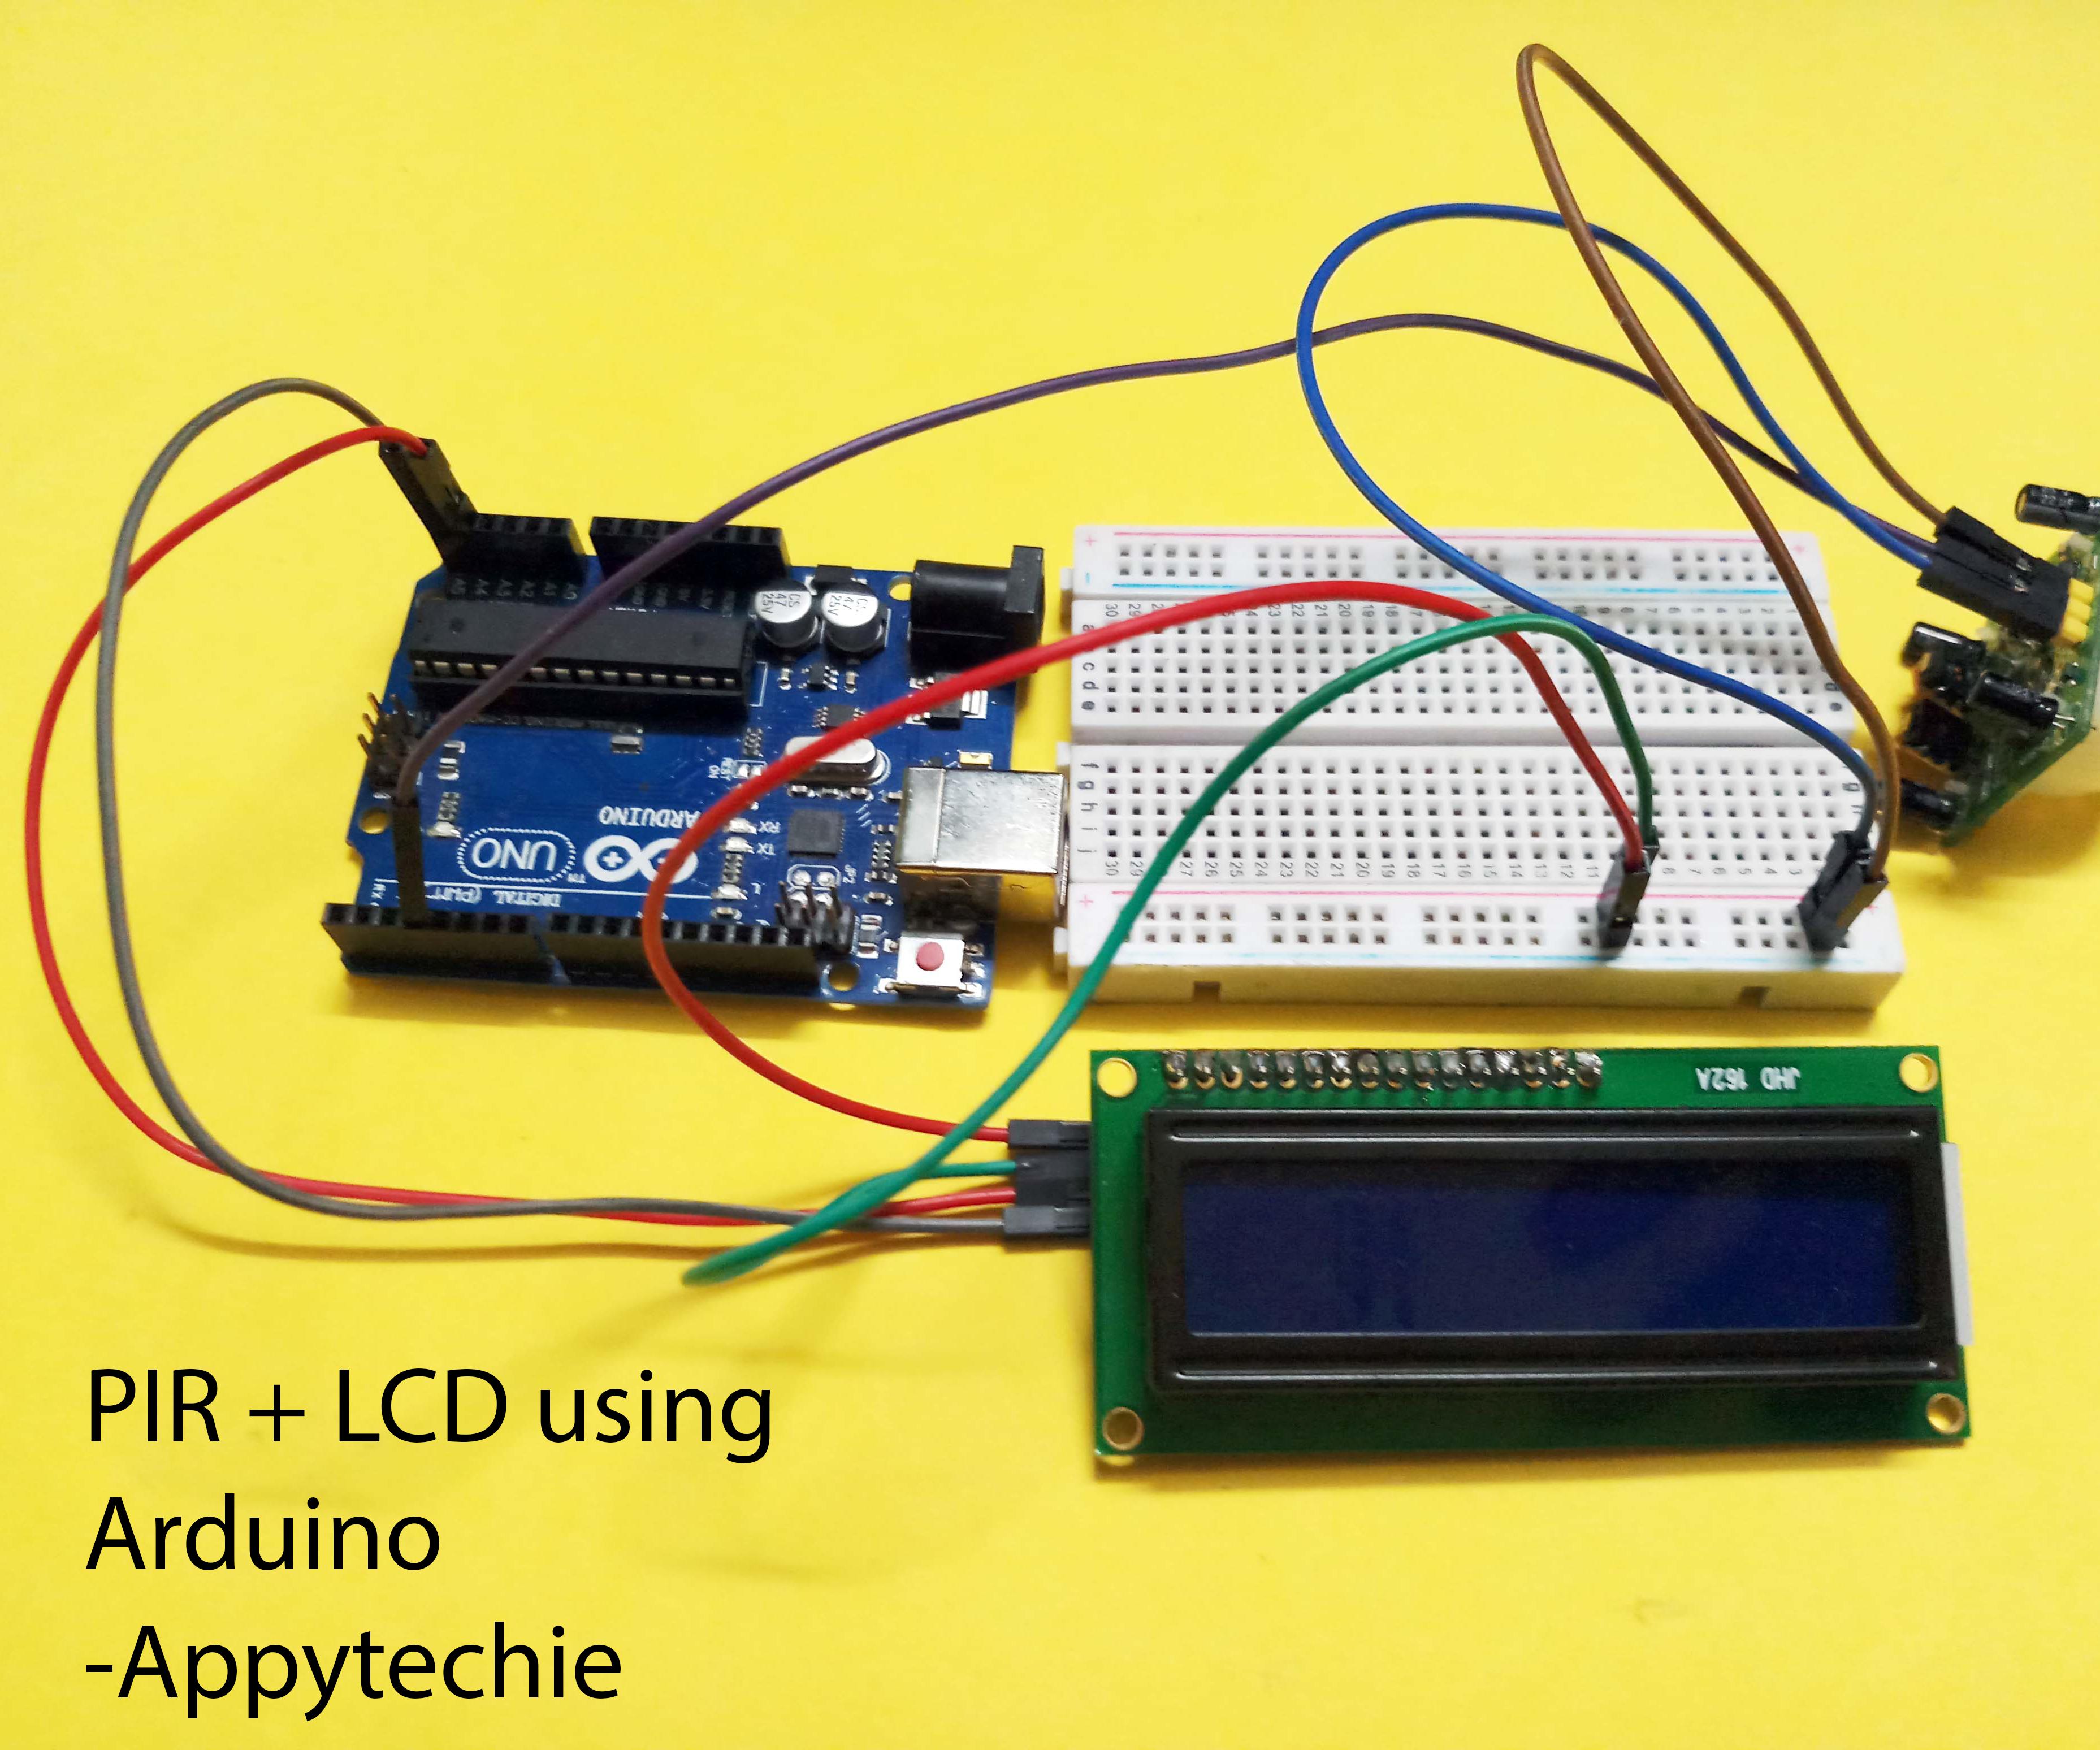 PIR + LCD Using Arduino